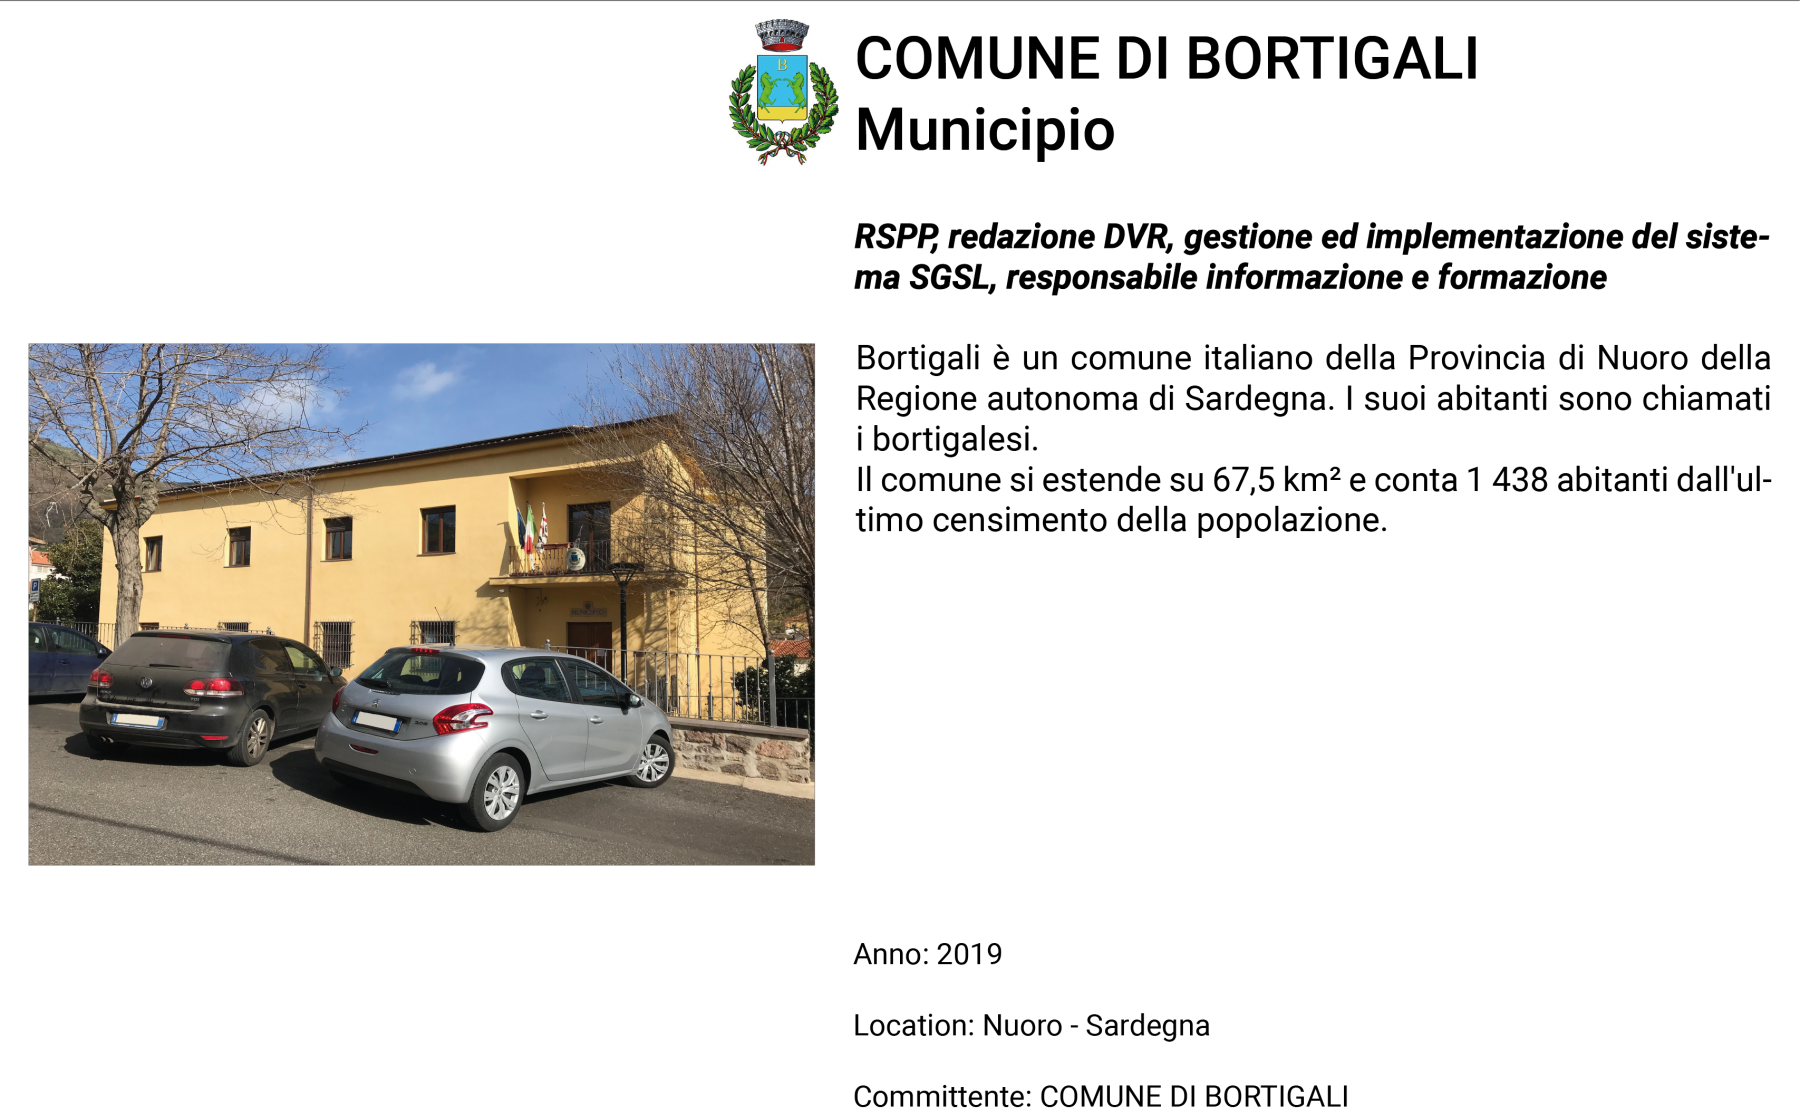 Bortigali-Municipio